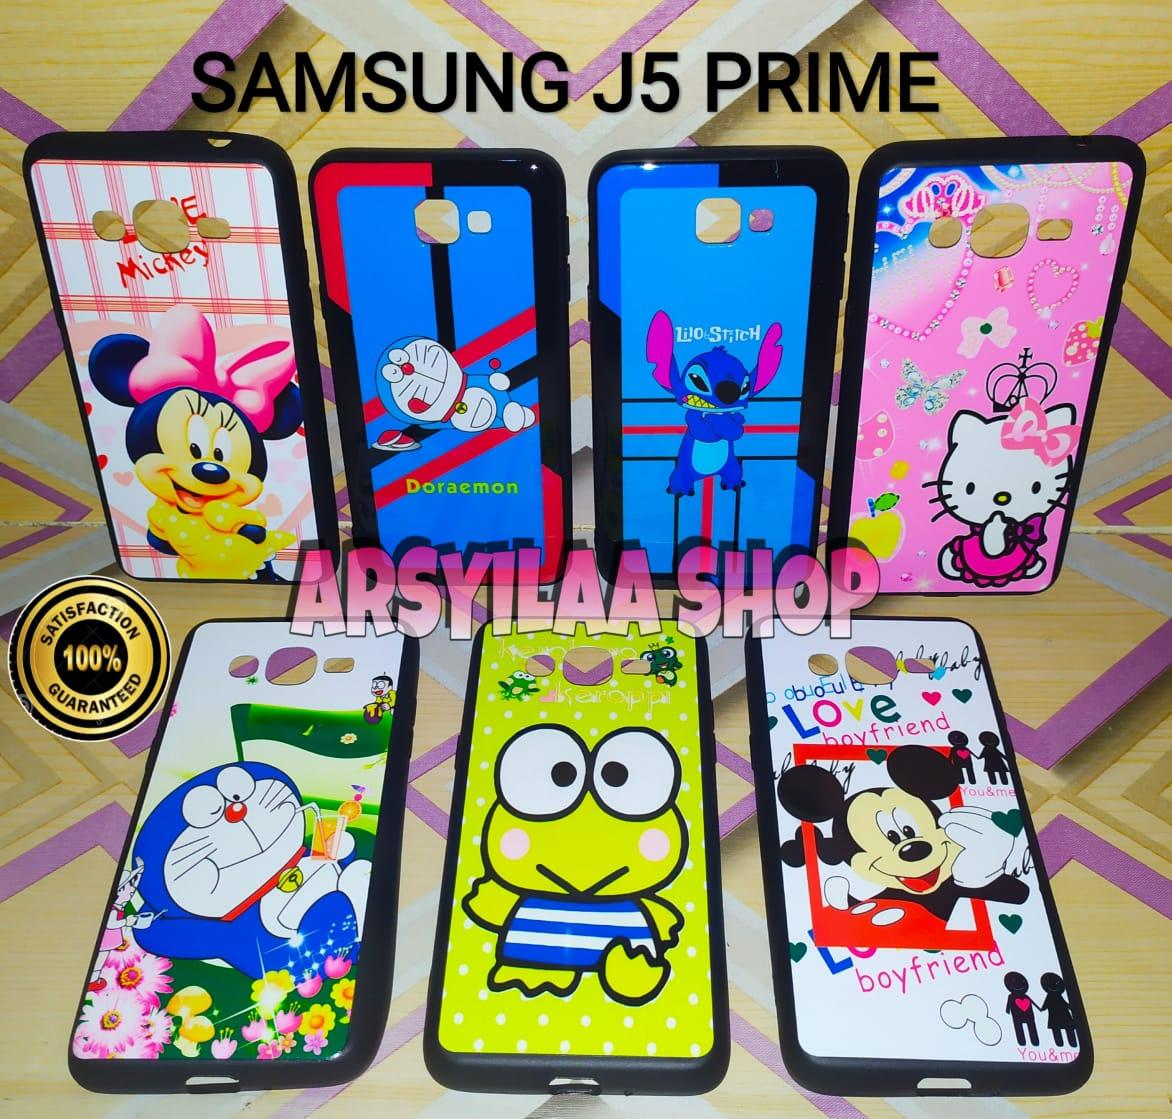 Softcase Karakter Elegant For Samsung J5 Prime Bisa COD Dan Harga Terjangkau BY ARS